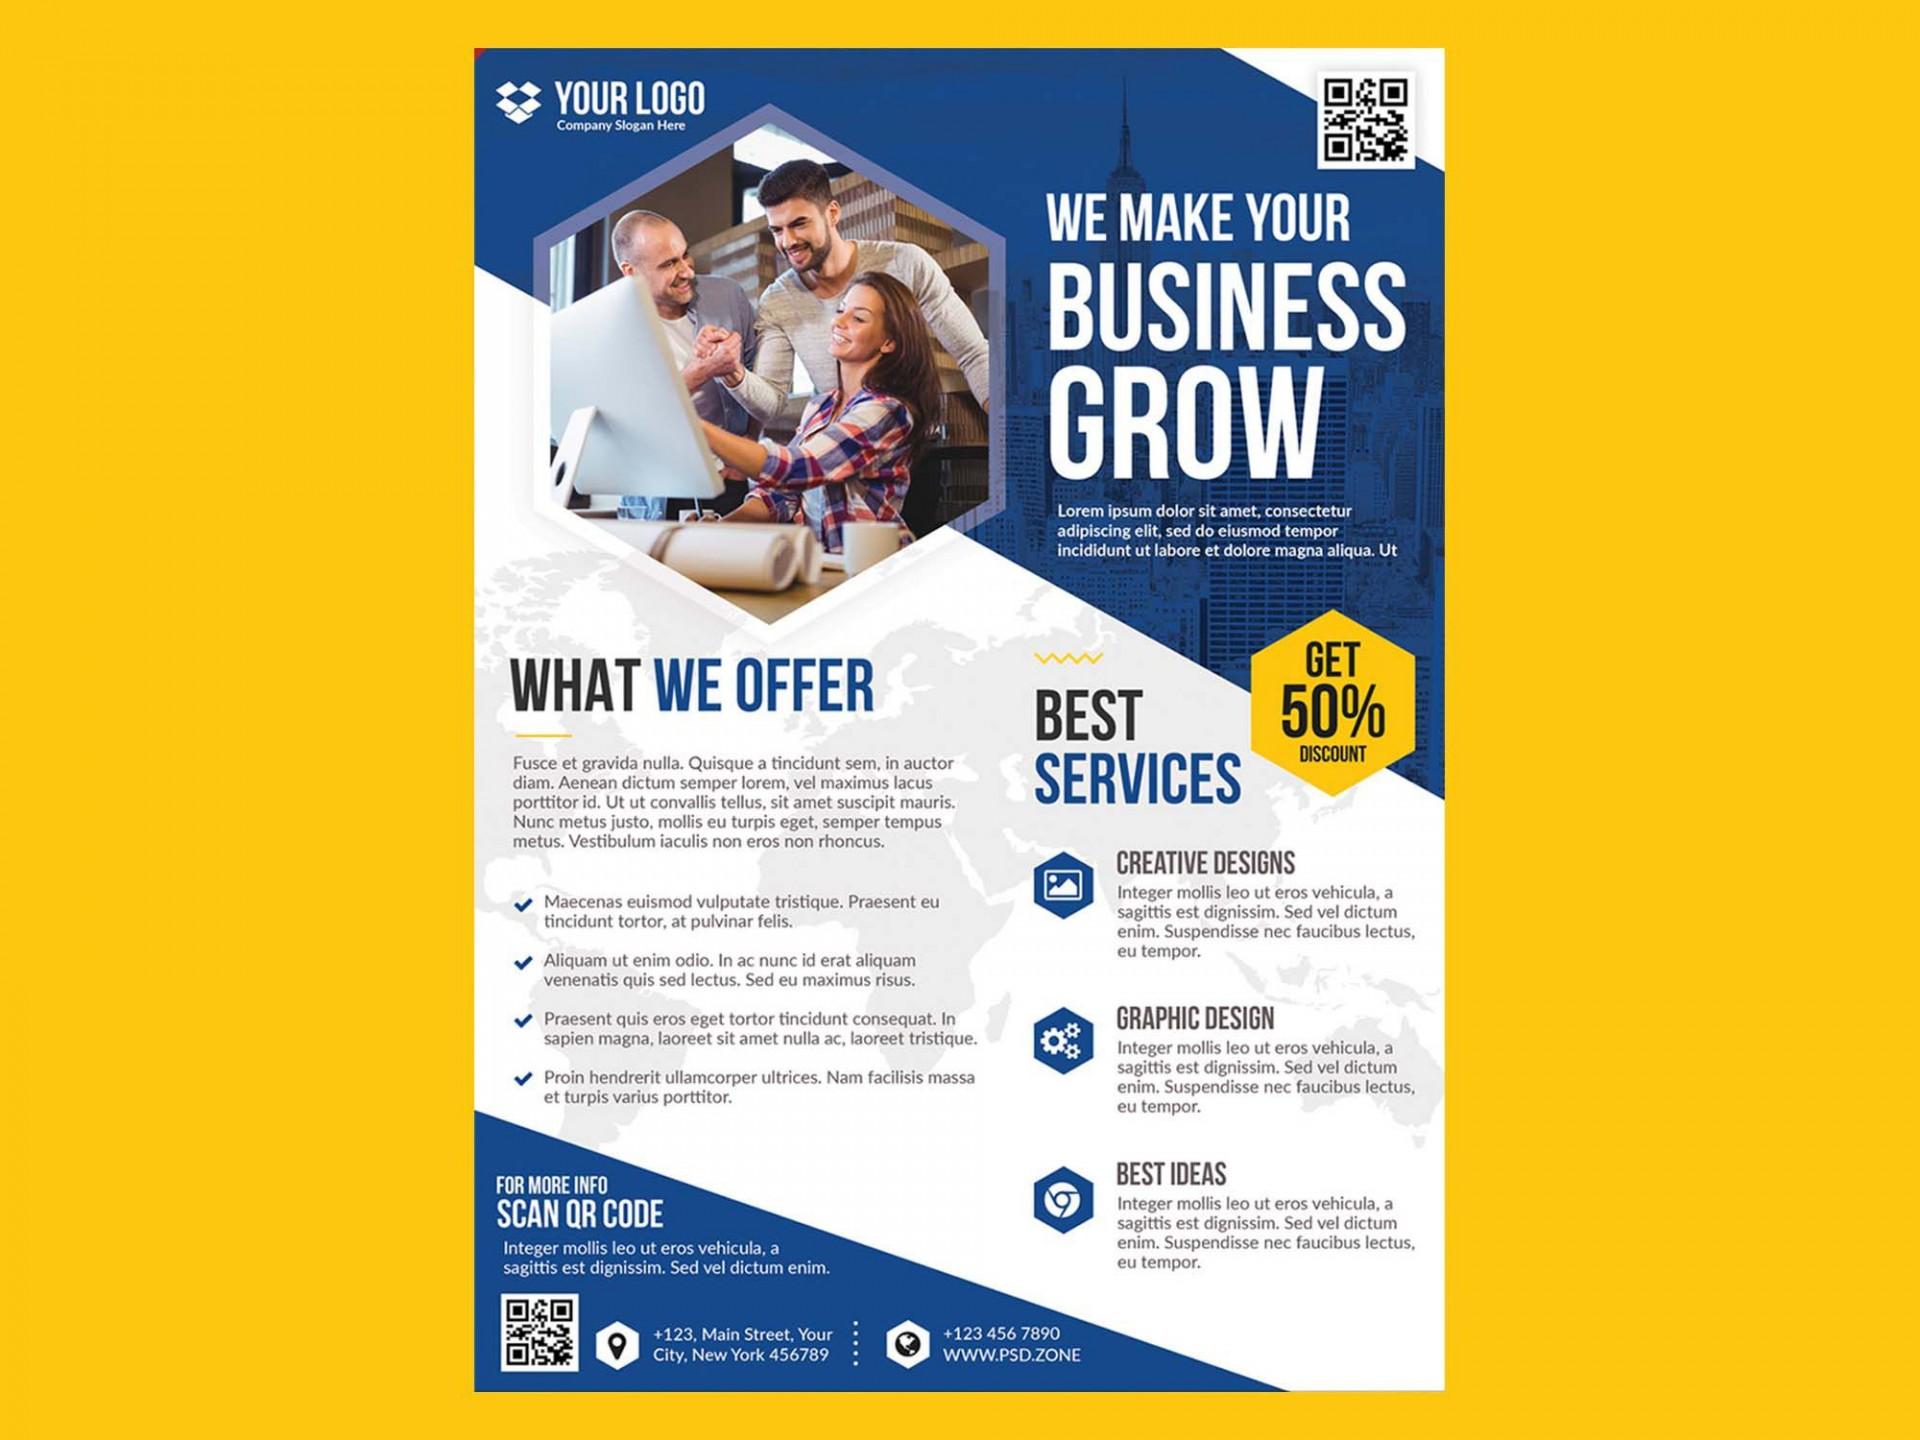 004 Fearsome Busines Flyer Template Free Idea  Psd 2018 Vector Brochure Training1920